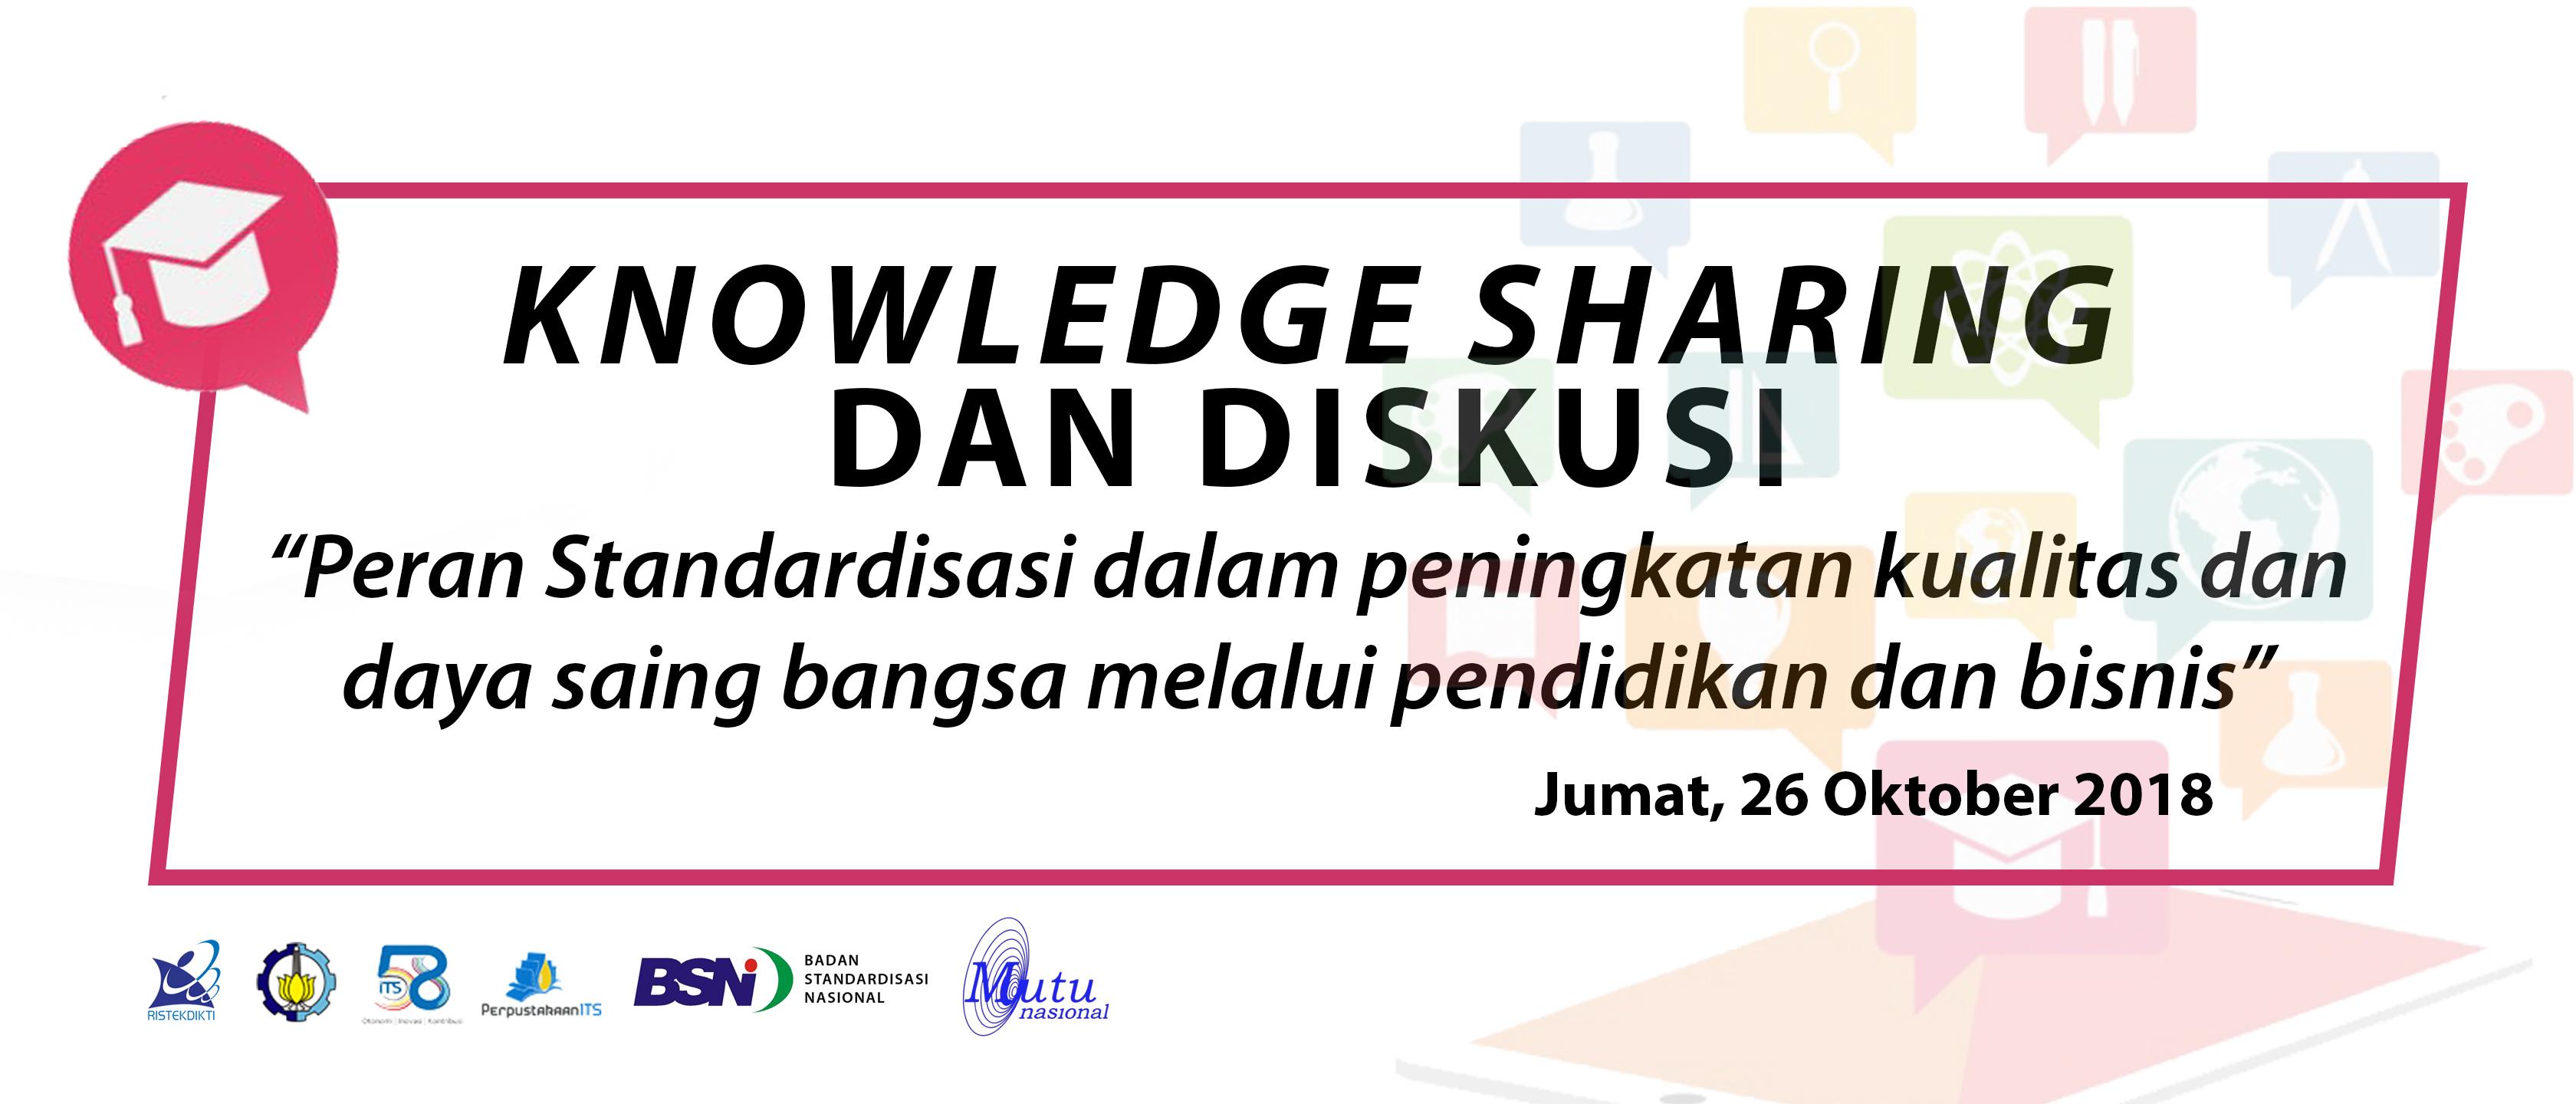 Materi Knowledge Sharing & Diskusi